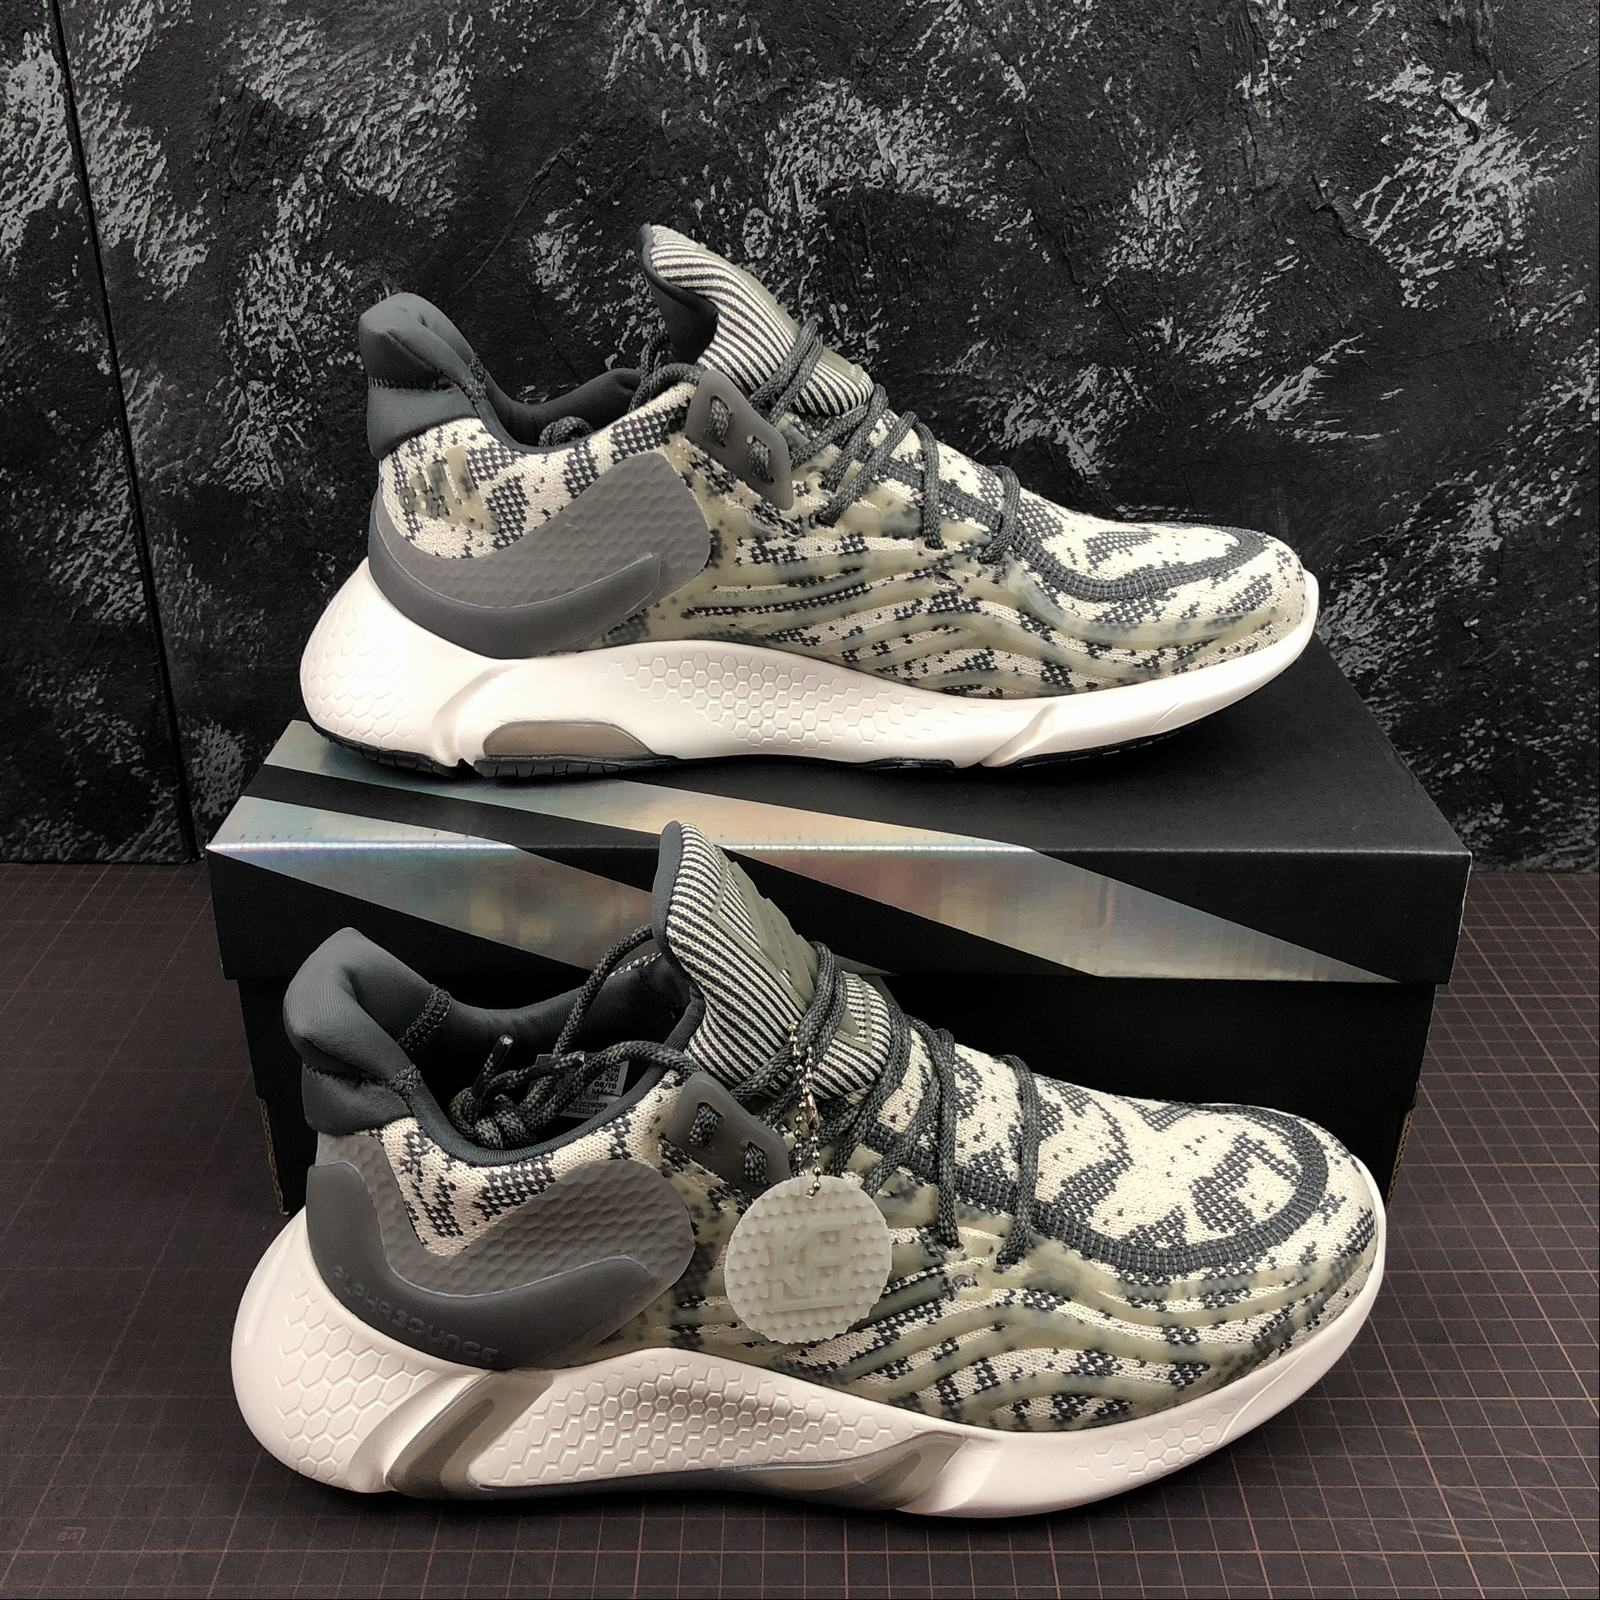 giay-sneaker-adidas-alphabounce-yeezy-boost-ay6687